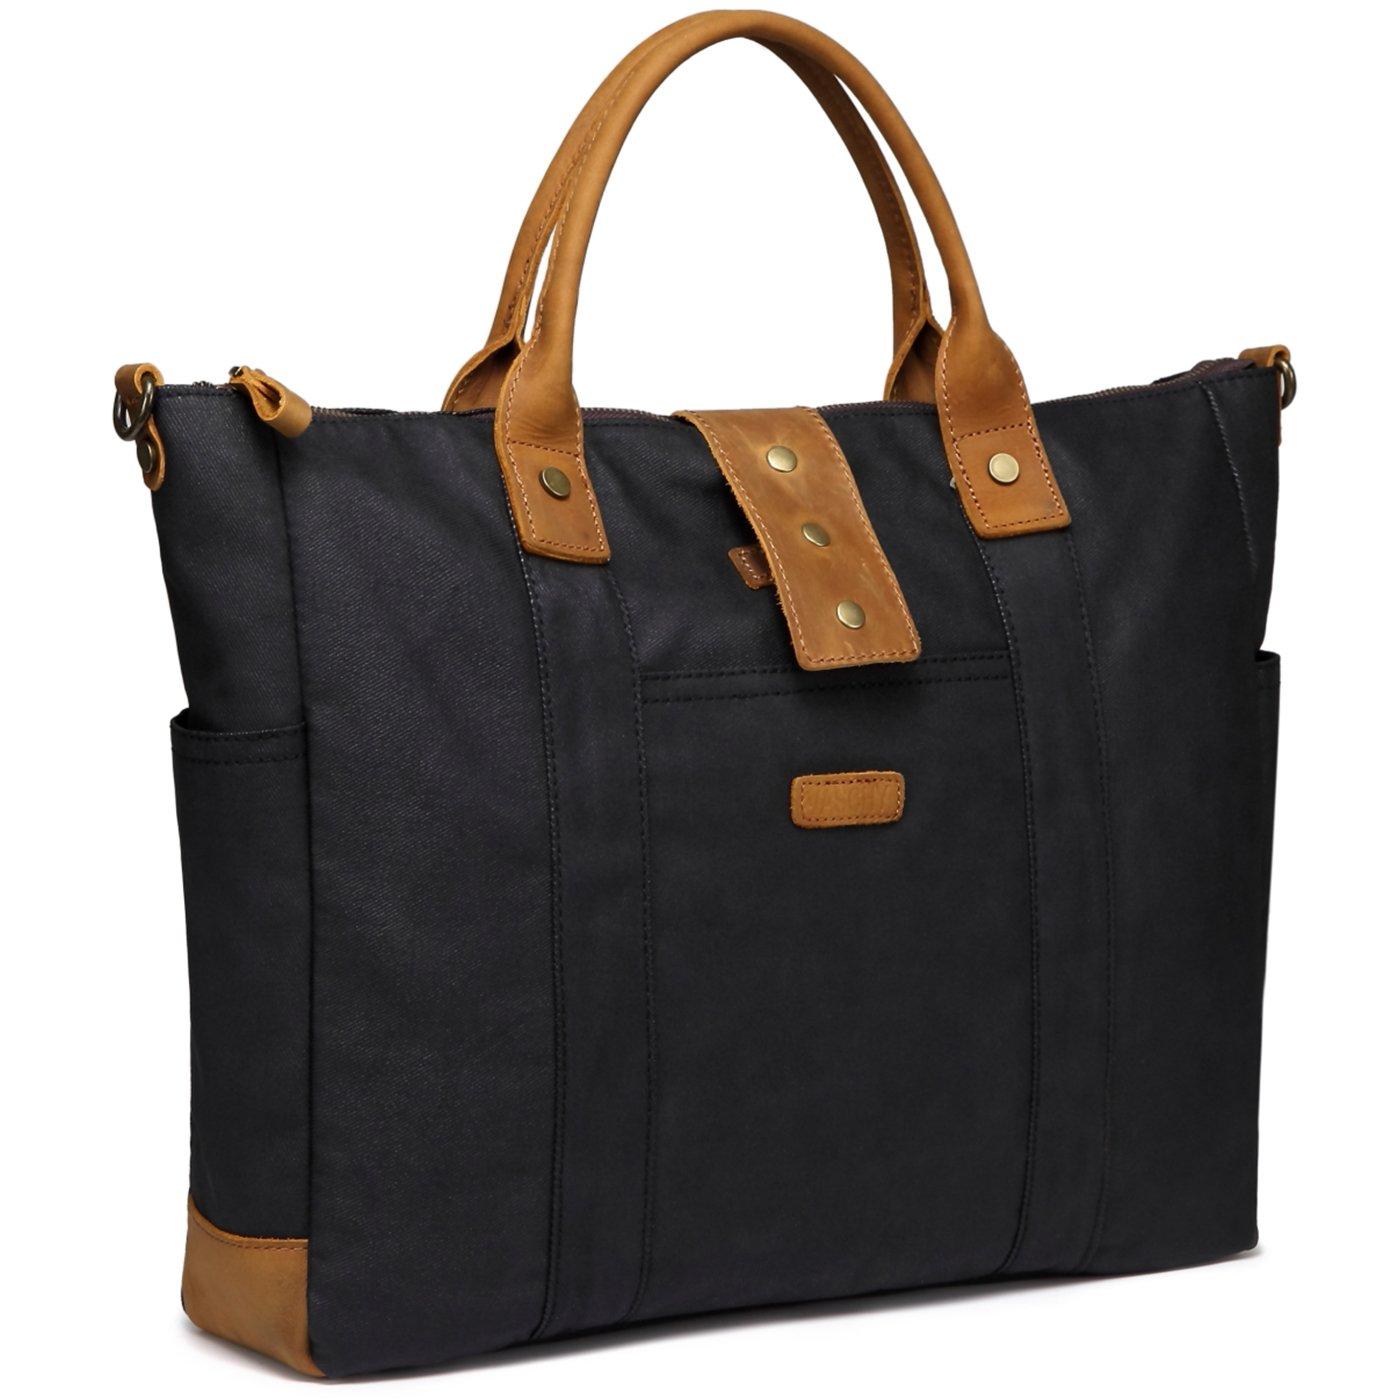 Fashion week Cf bag: shopping january for girls